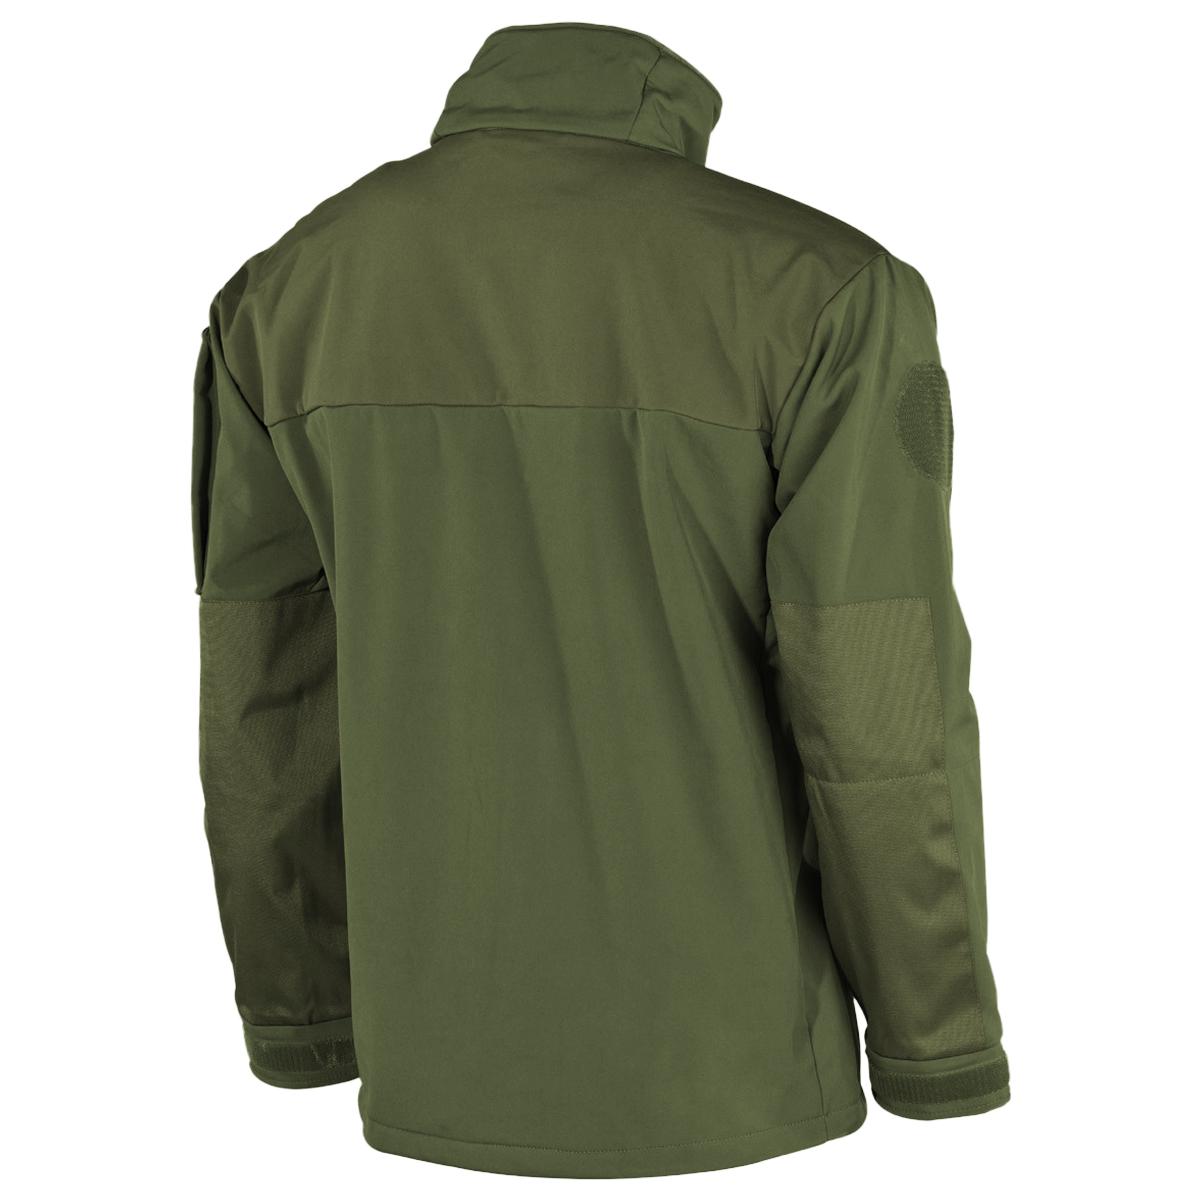 07d35dbedda8 Details about MFH Australia Soft Shell Jacket Mens Outdoor Hiking Trekking  Military OD Green